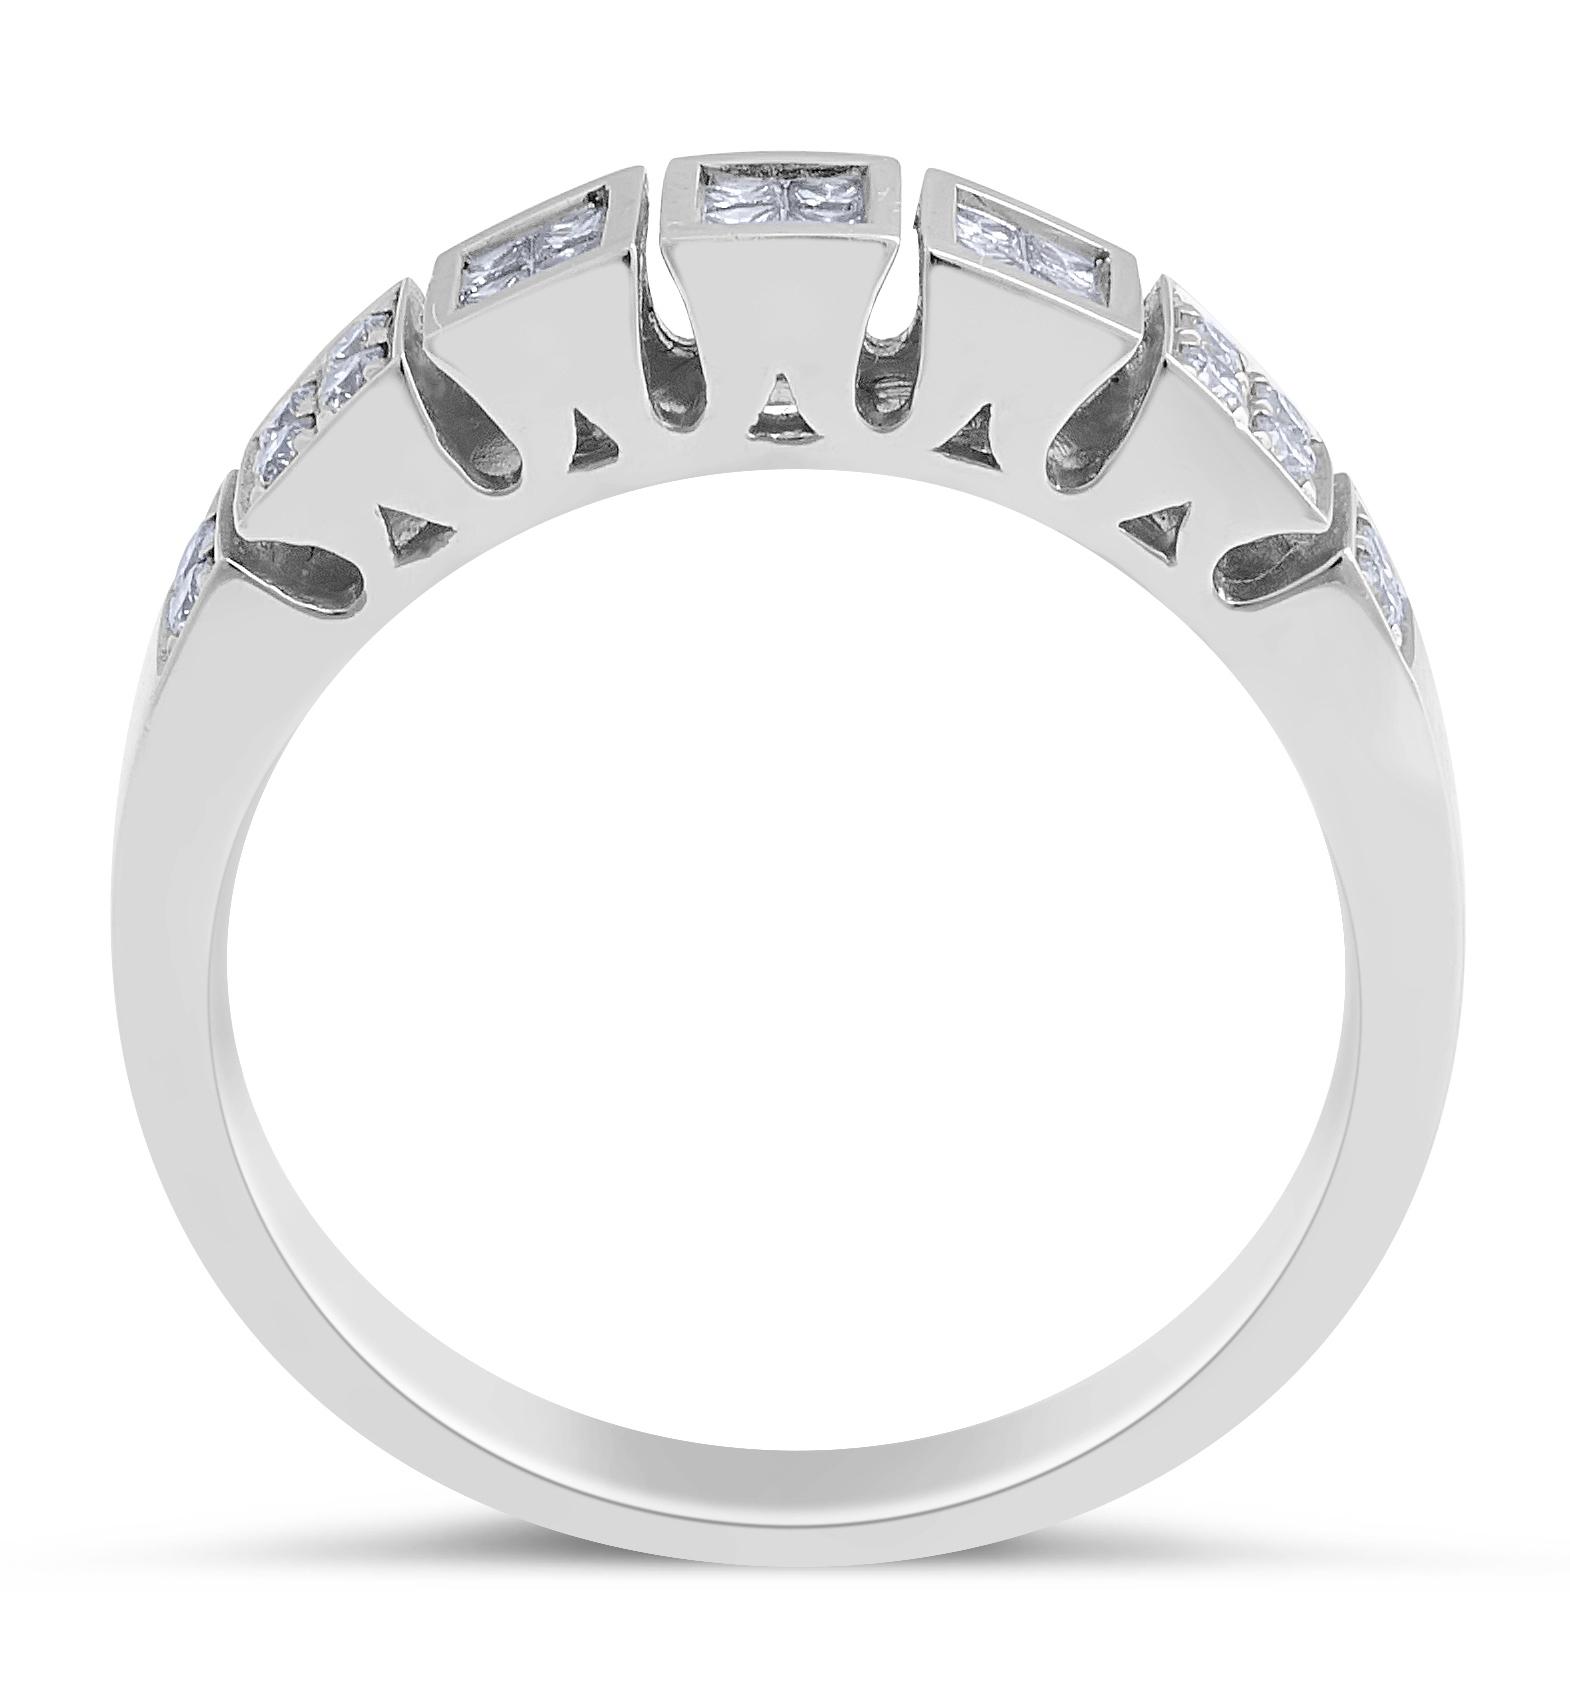 18 Karat White Gold Diamond Wedding Band Modern Style